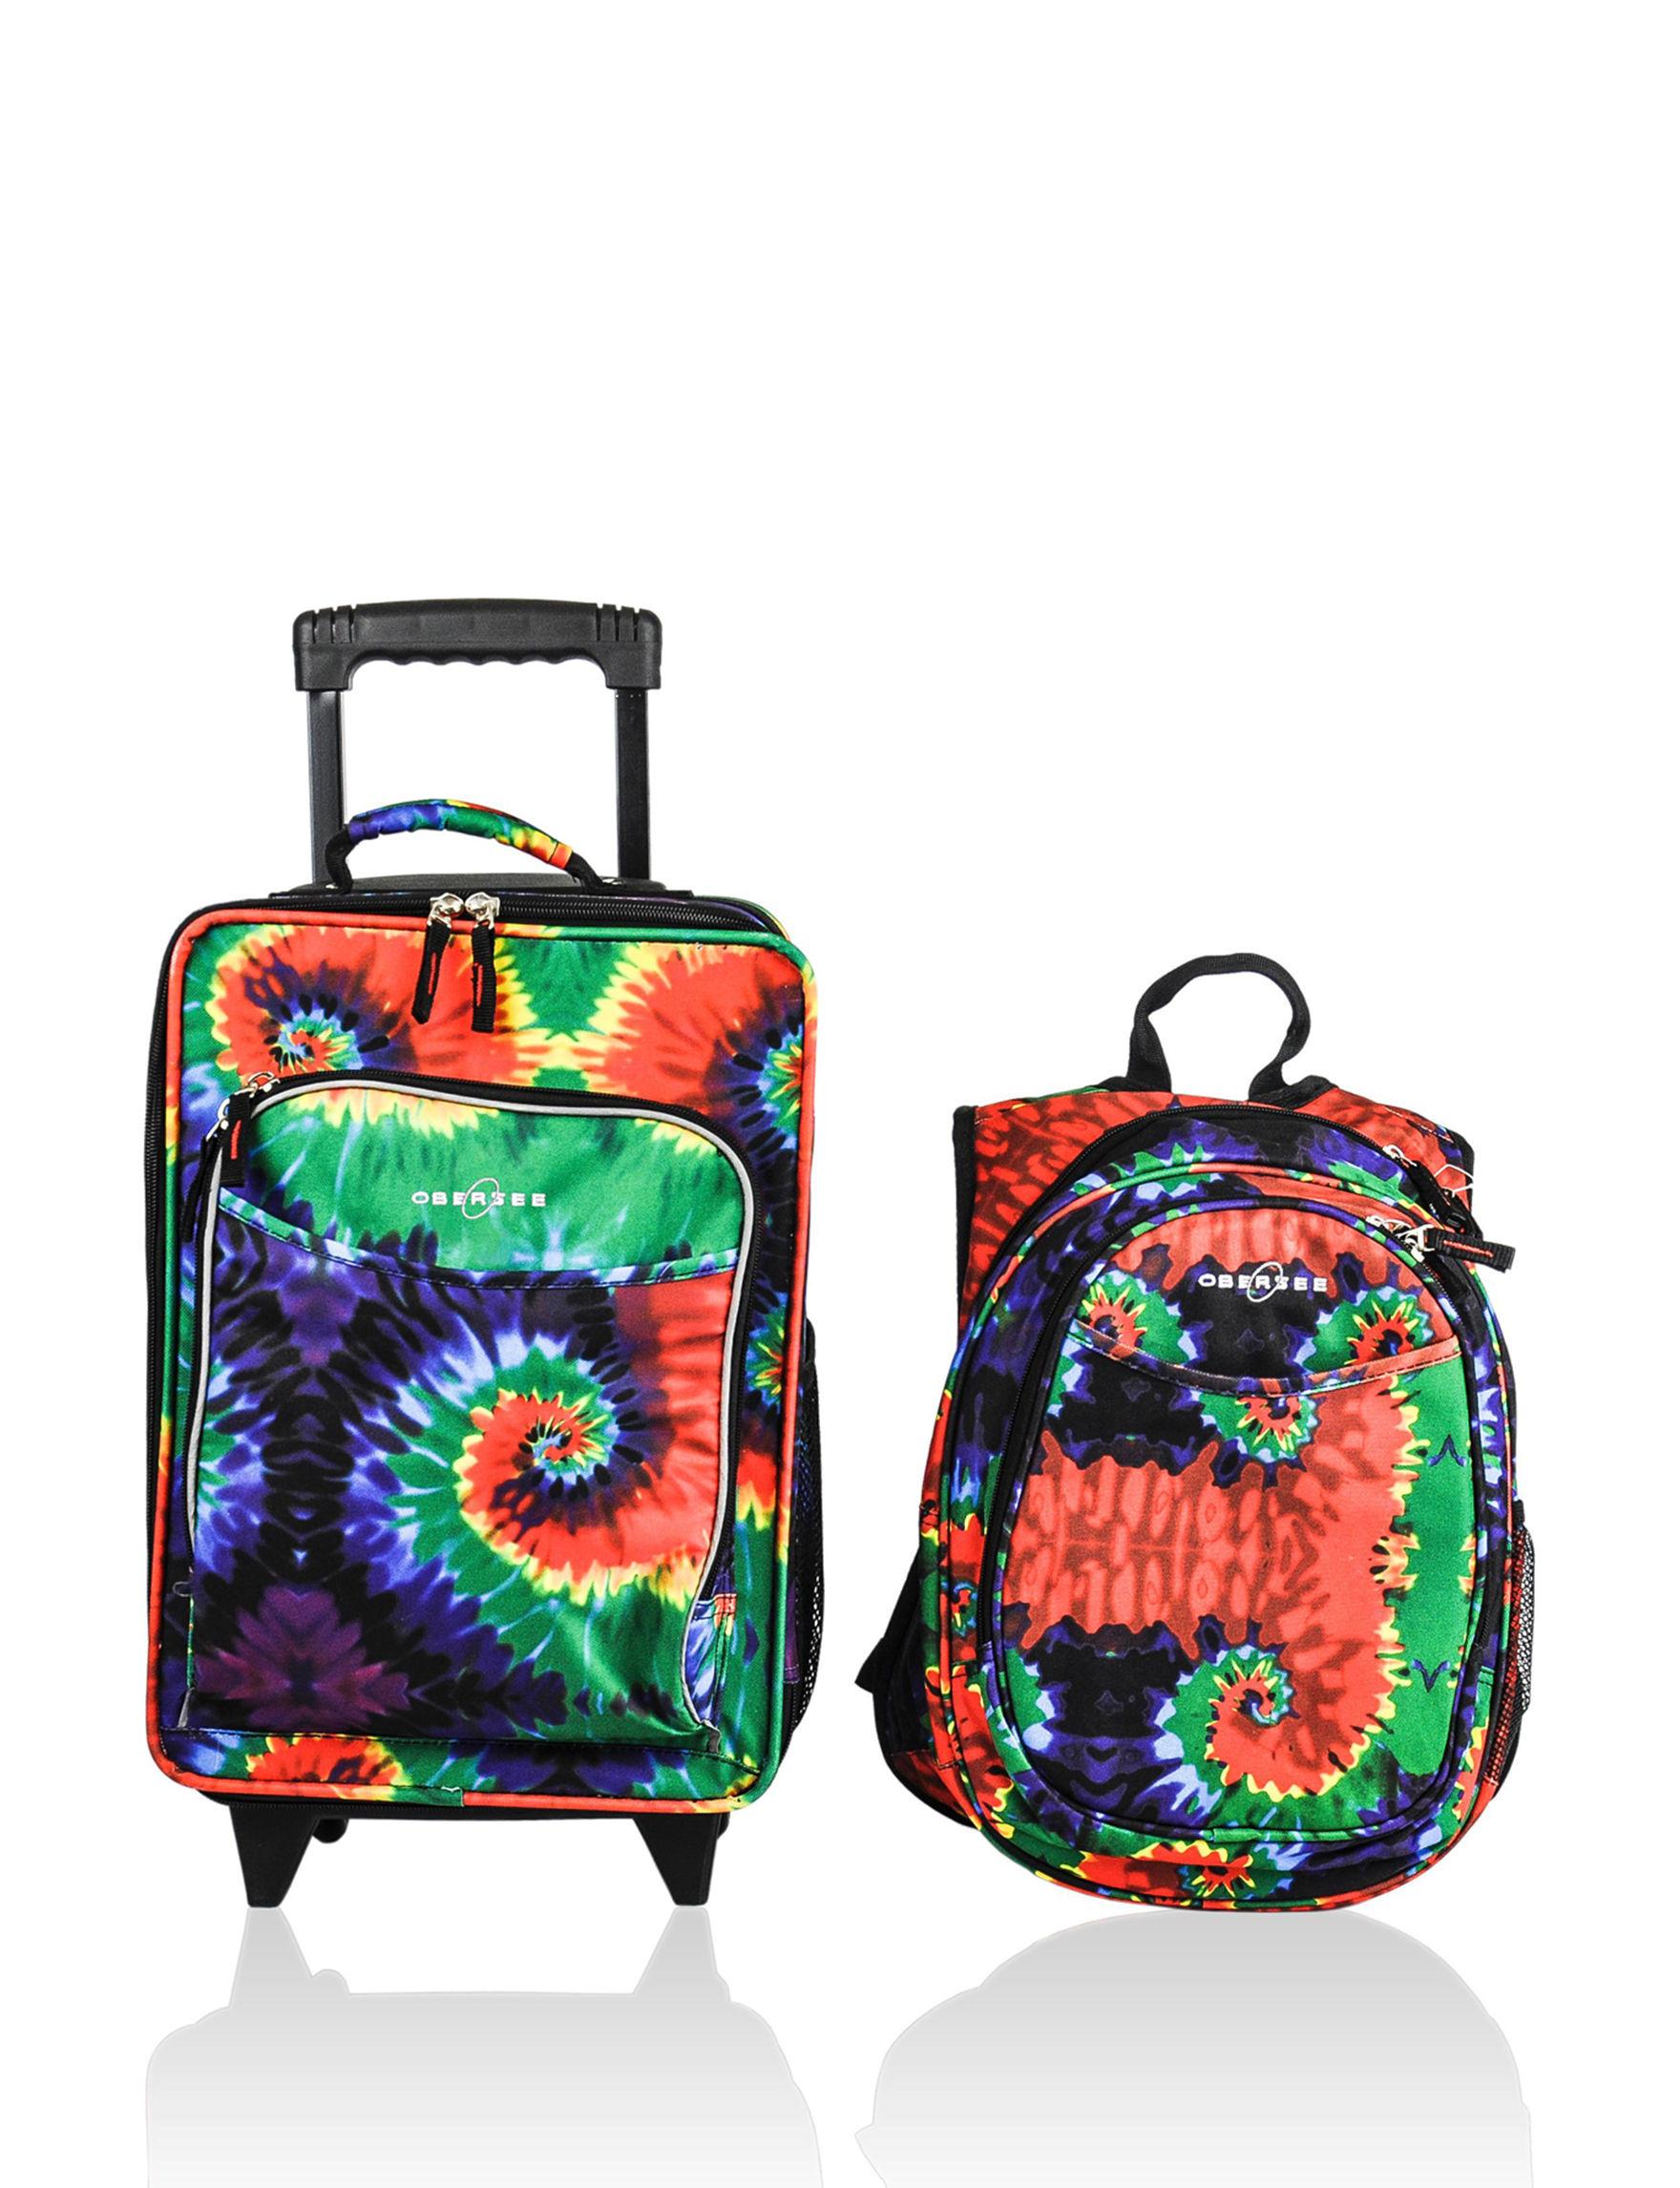 Obersee Tie Dye Luggage Sets